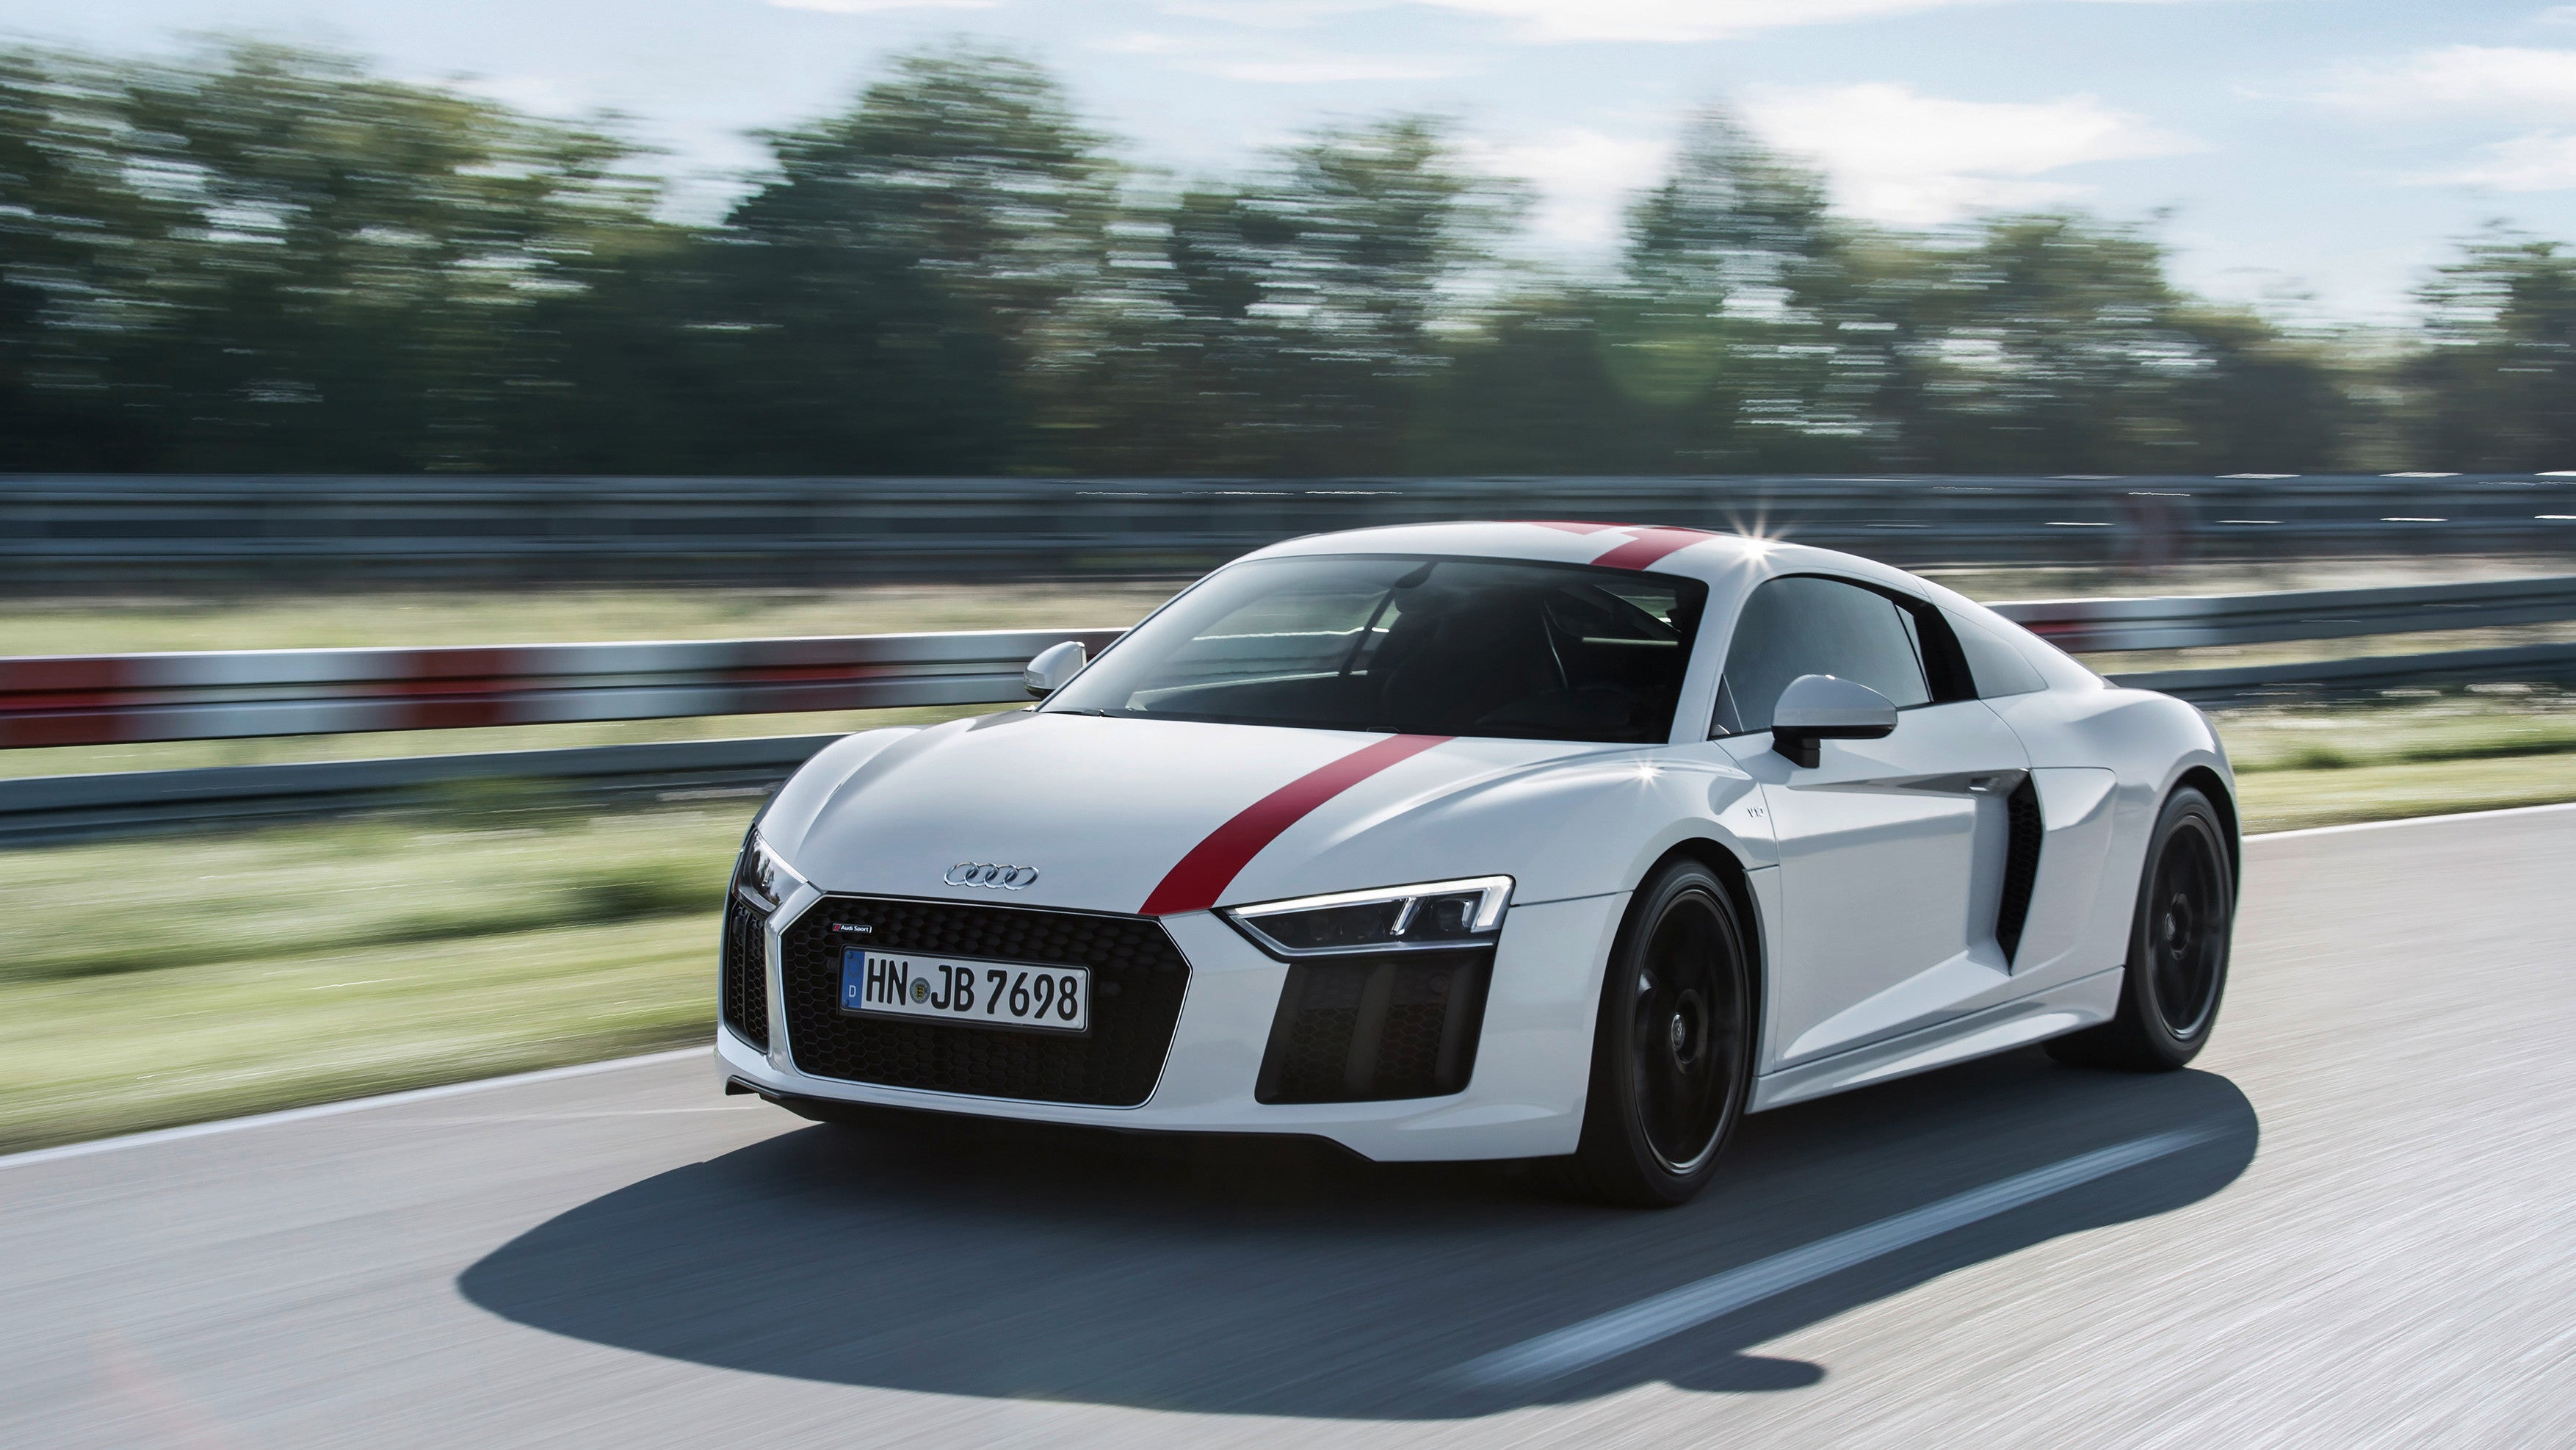 Assez Audi R8 News, Videos, Reviews and Gossip - Jalopnik IB67